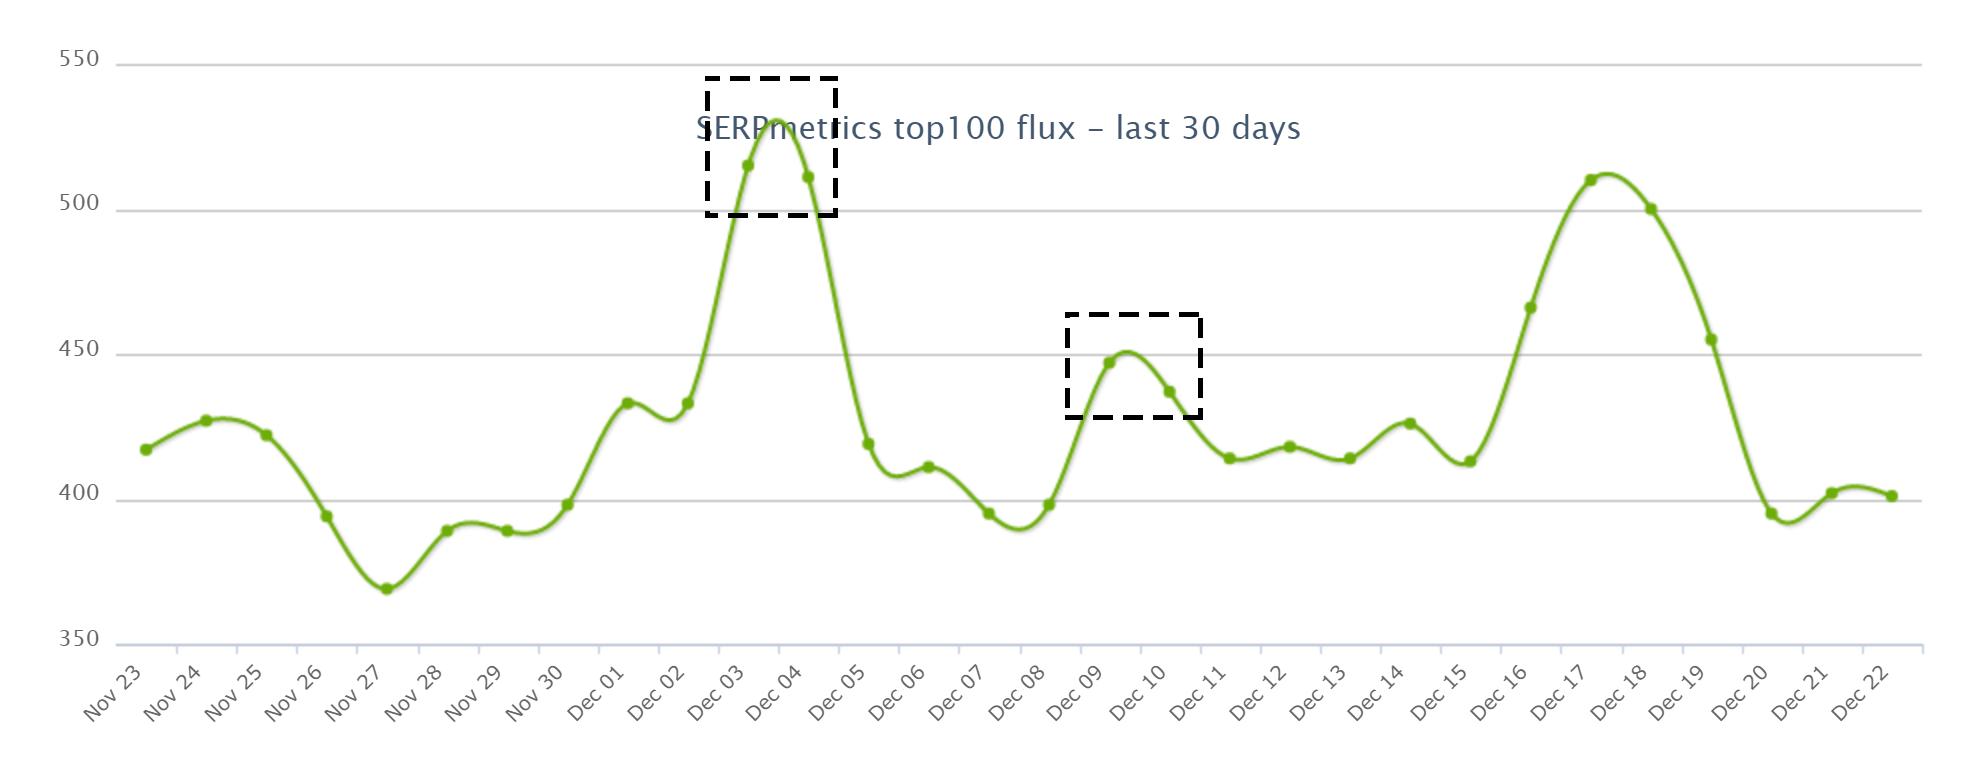 SERPmetricsの2020年12月4日からのコアアップデートによる順位変動